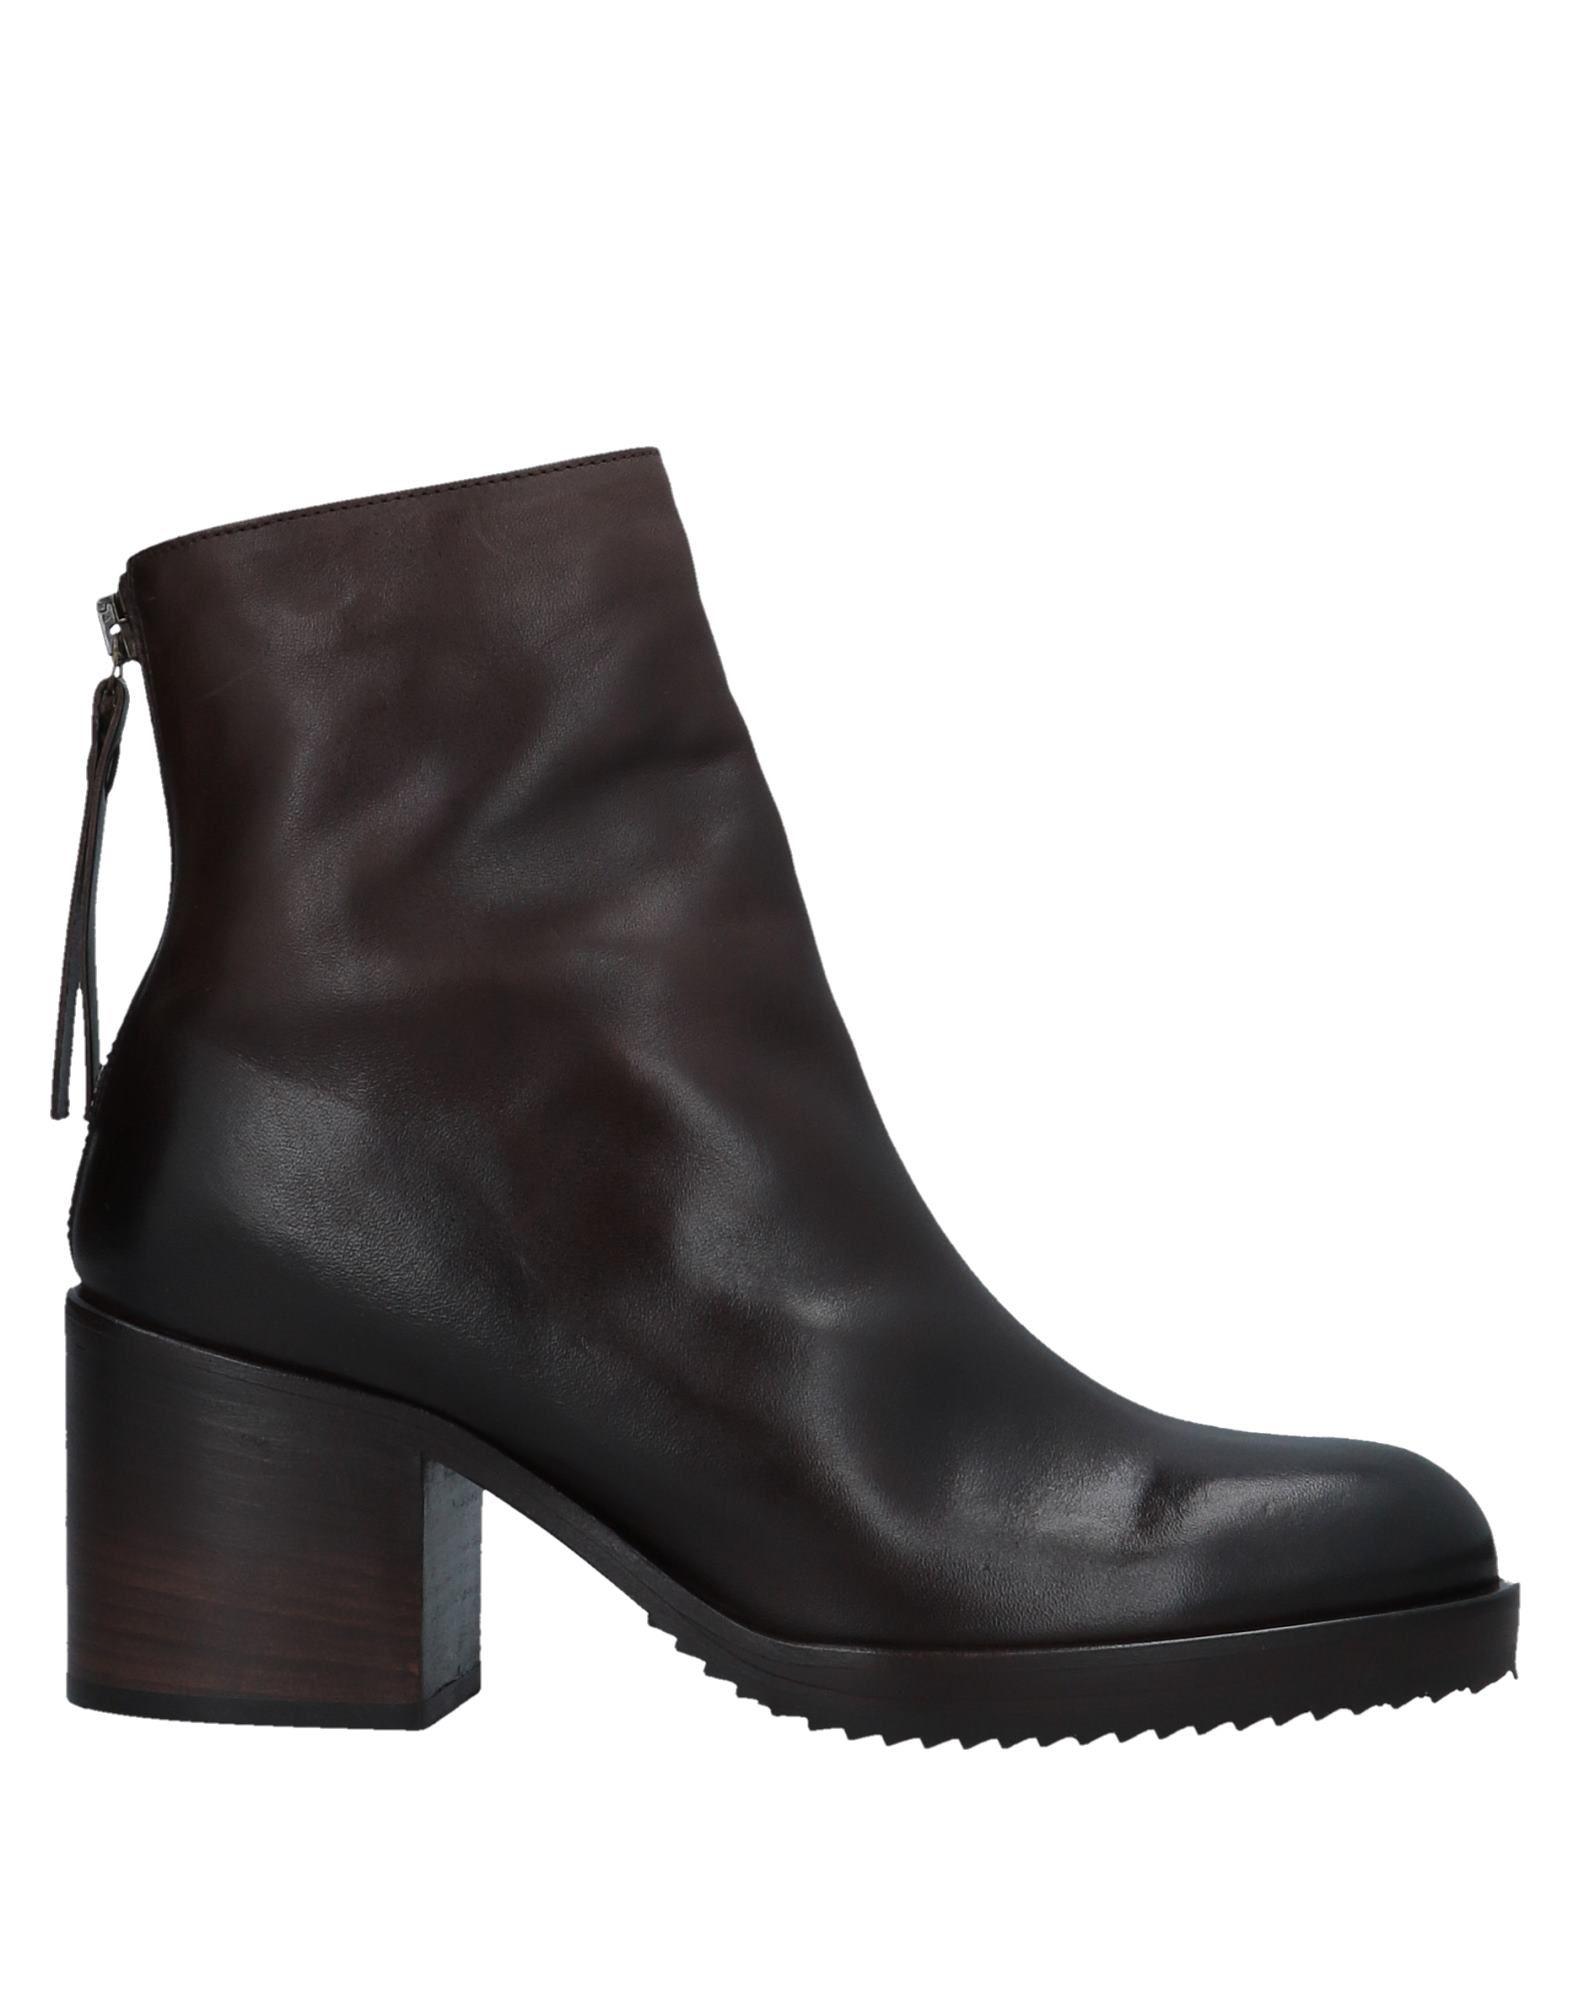 Sartori Gold Ankle Boot - Boots Women Sartori Gold Ankle Boots - online on  Australia - 11261211QJ 5e7299